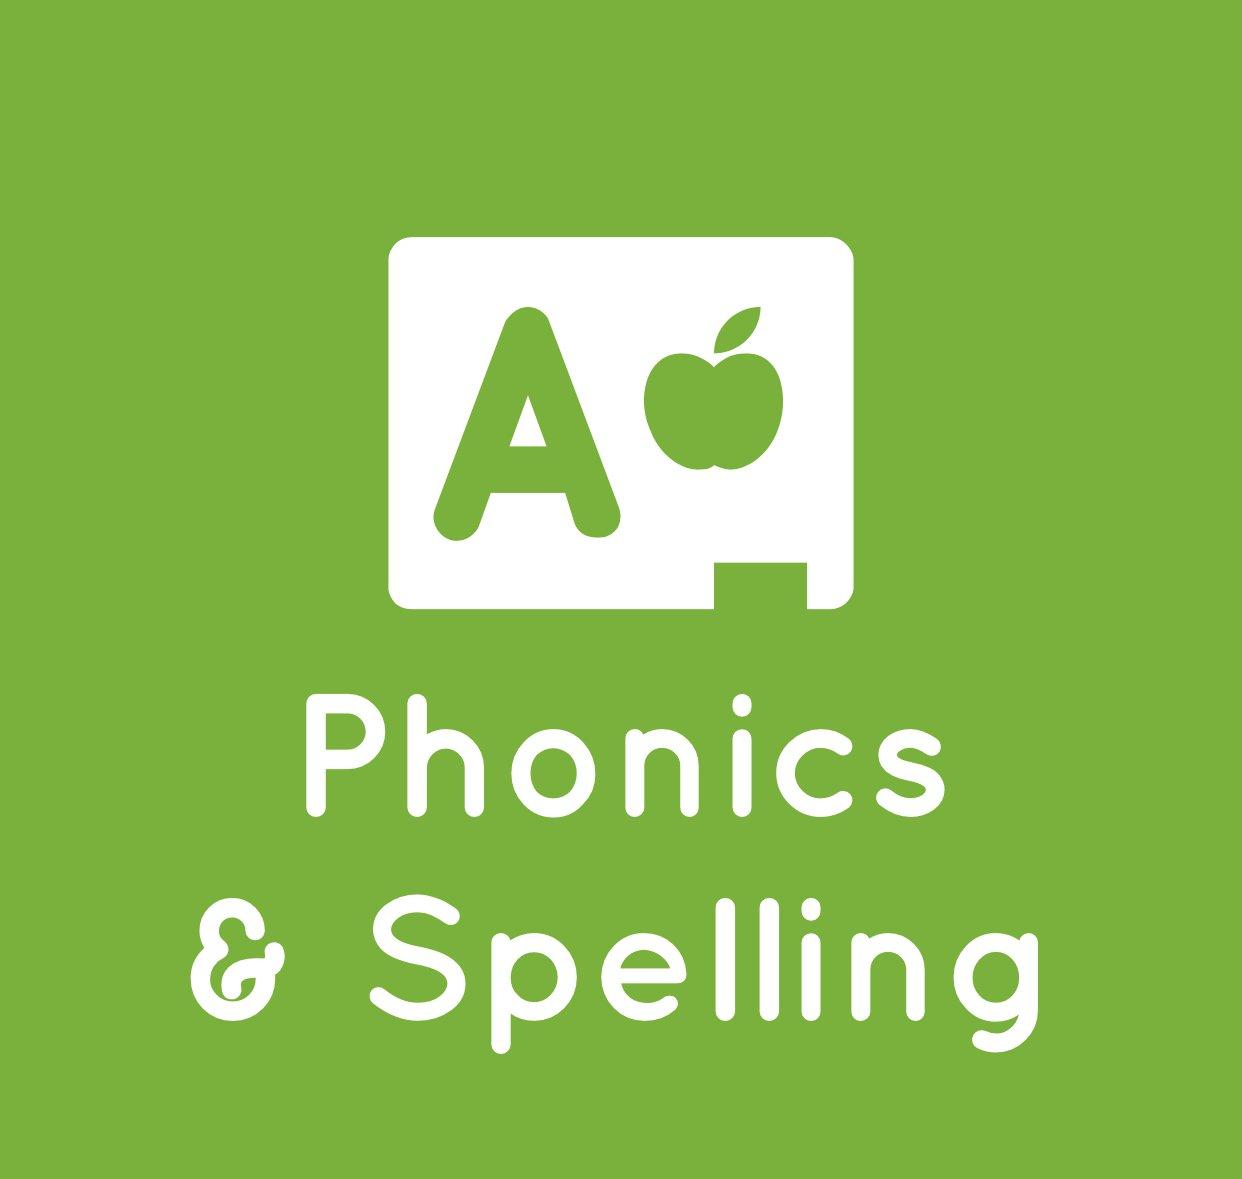 Phonics & Spelling